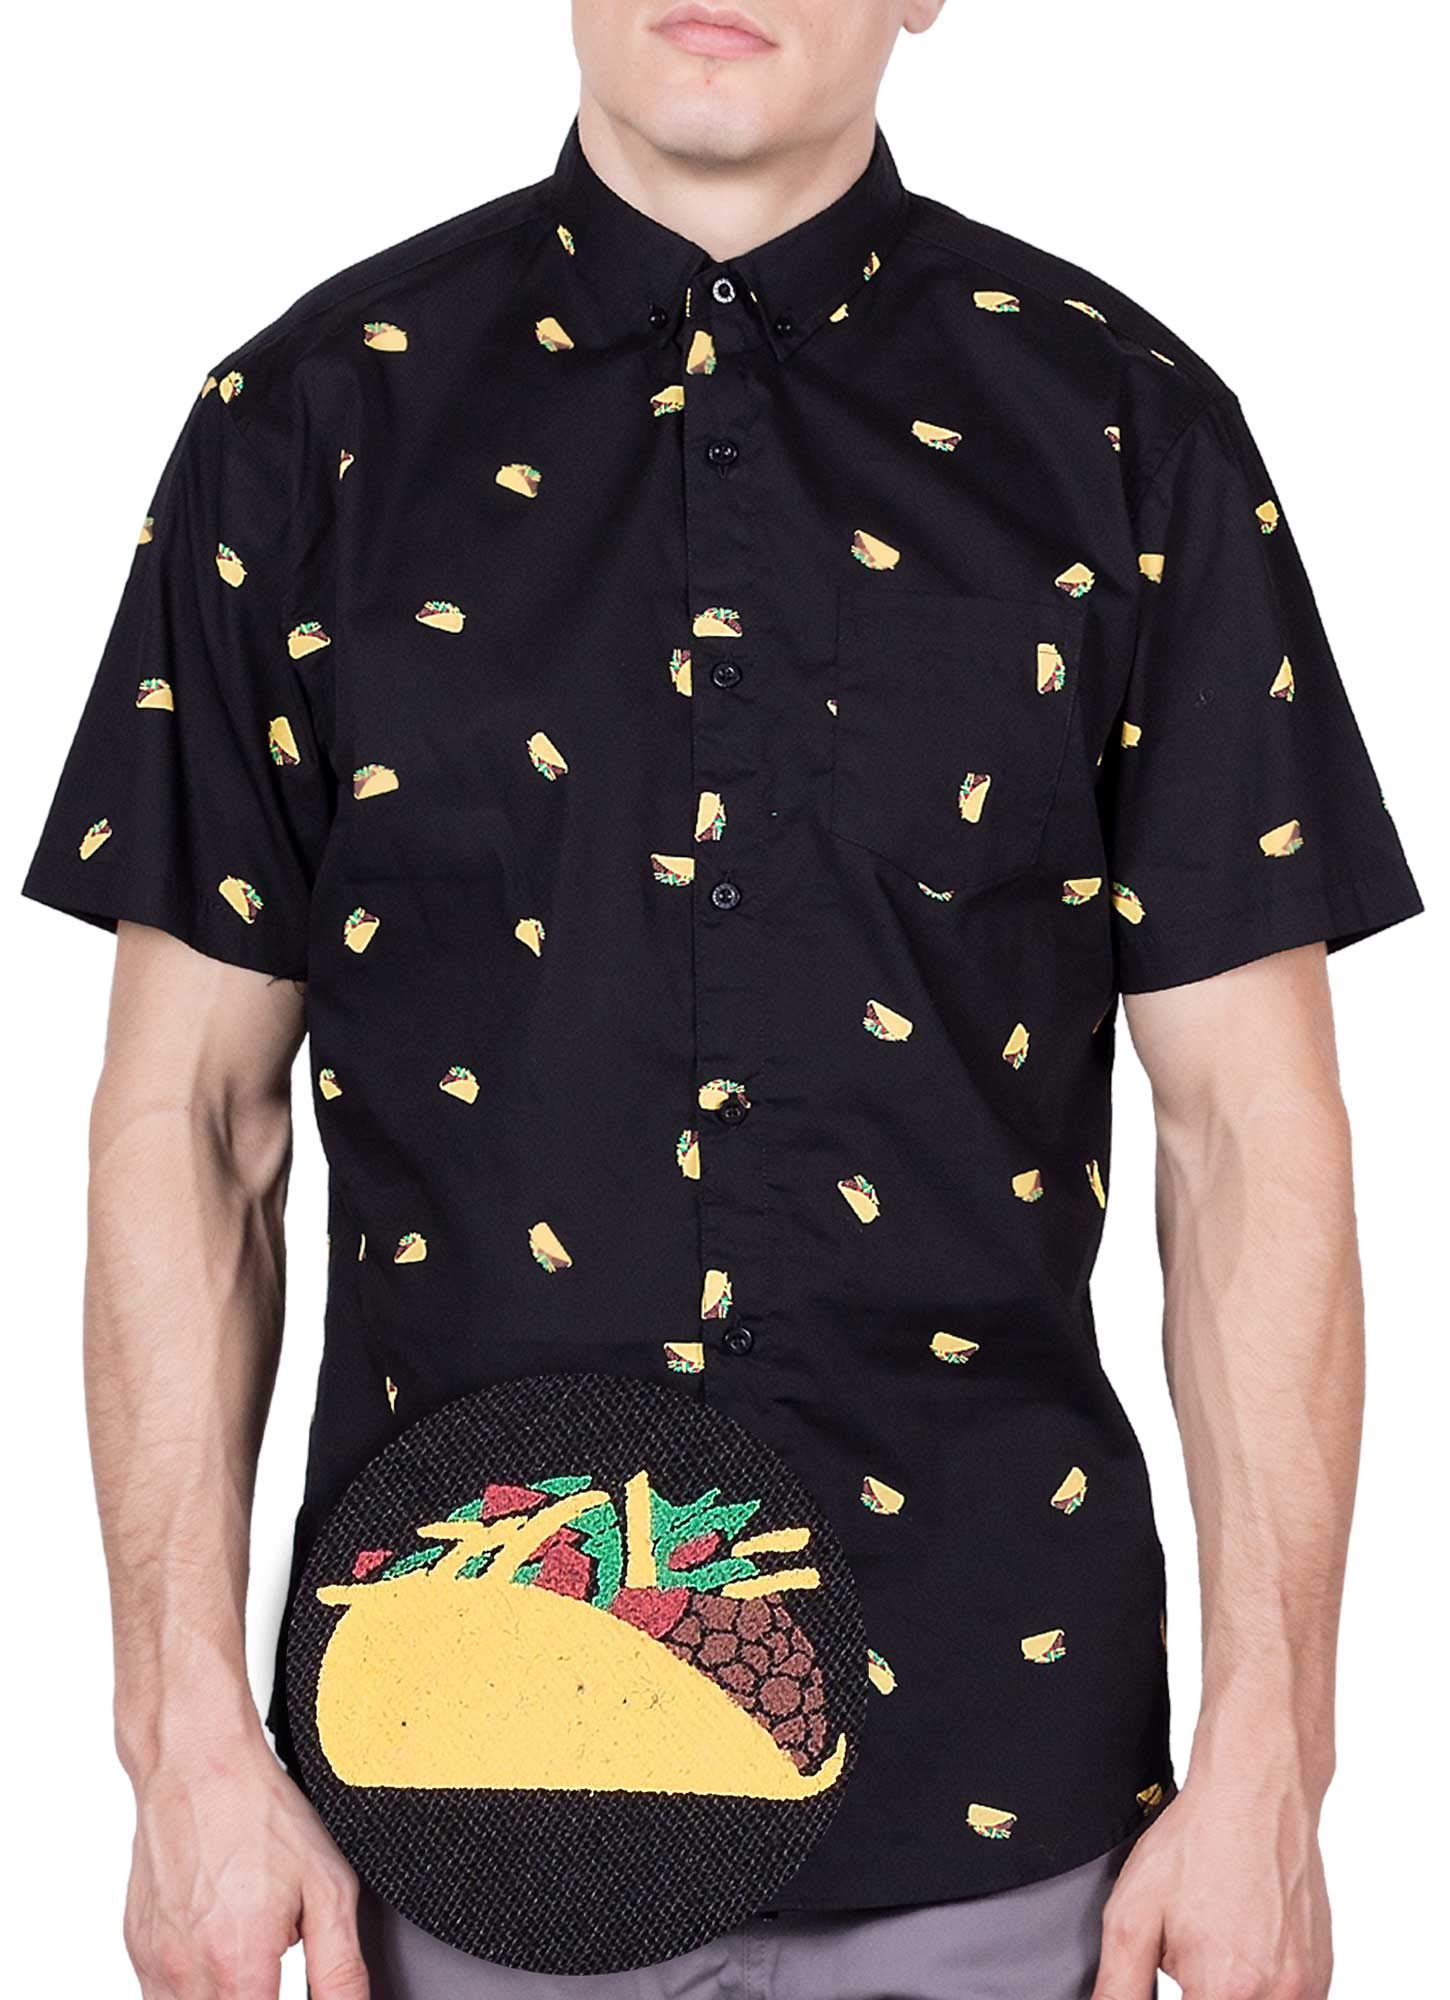 Visive Hawaiian Shirt for Mens Short Sleeve Black Taco Button Up Down Casual Shirts 3XL